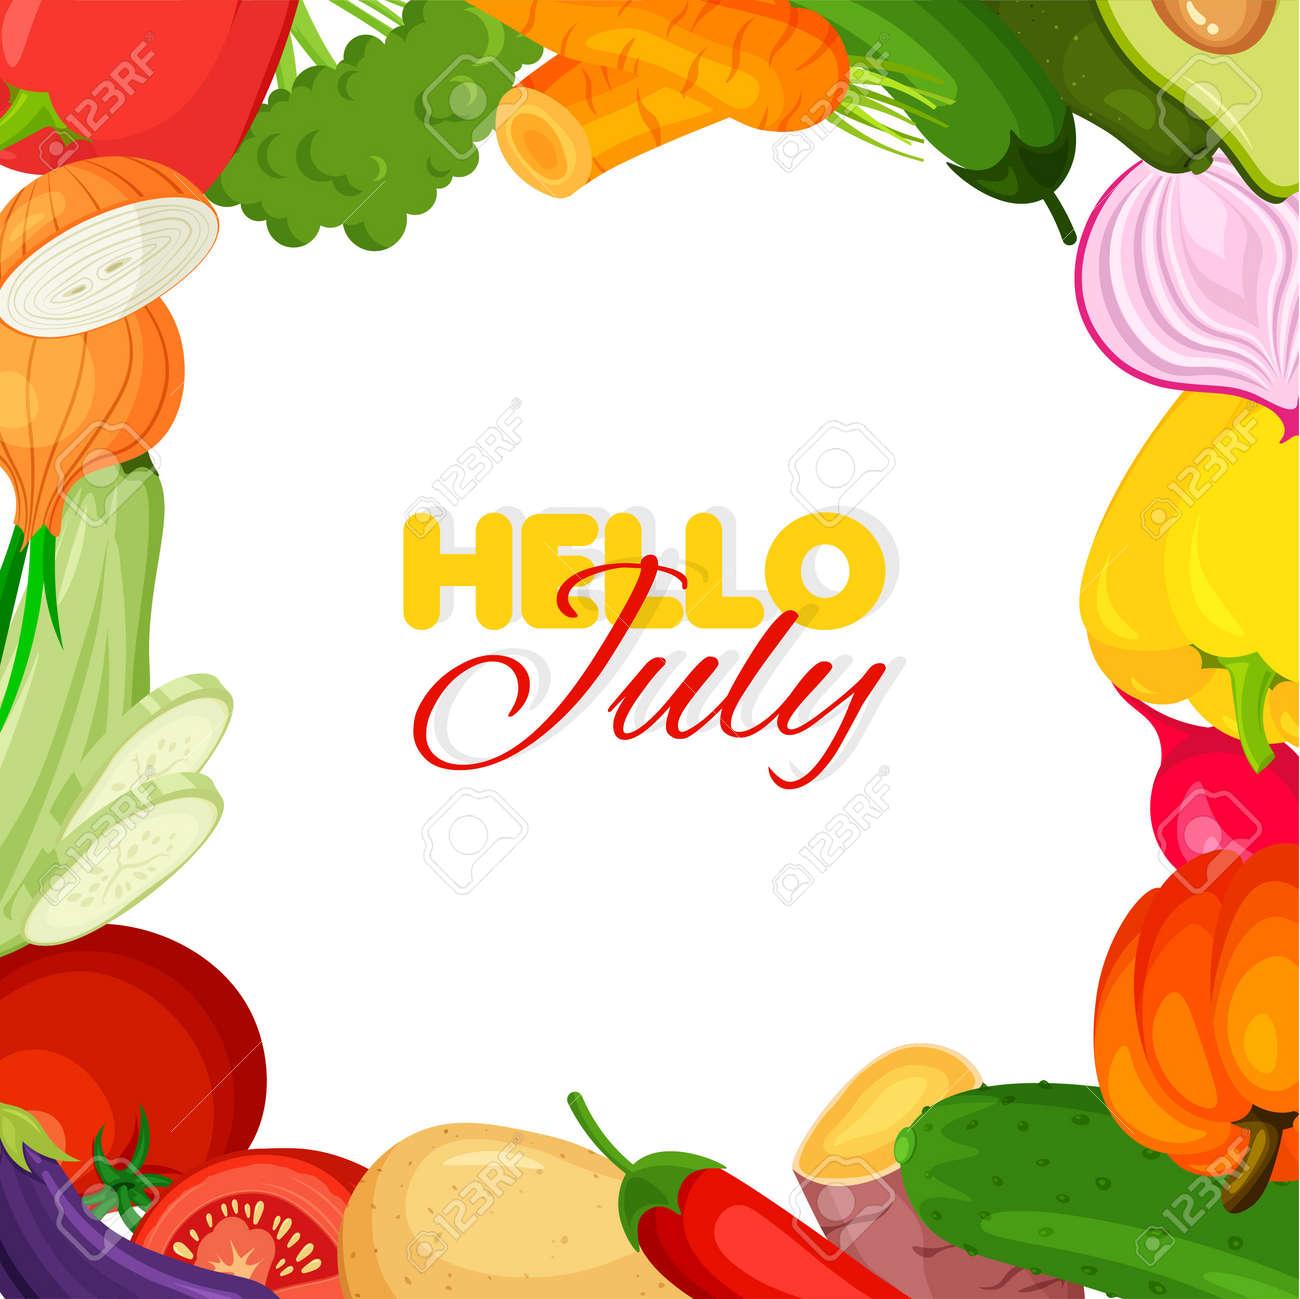 Vegetable frame. Summer banner template. Hello july concept. Vector illustration. - 169877679